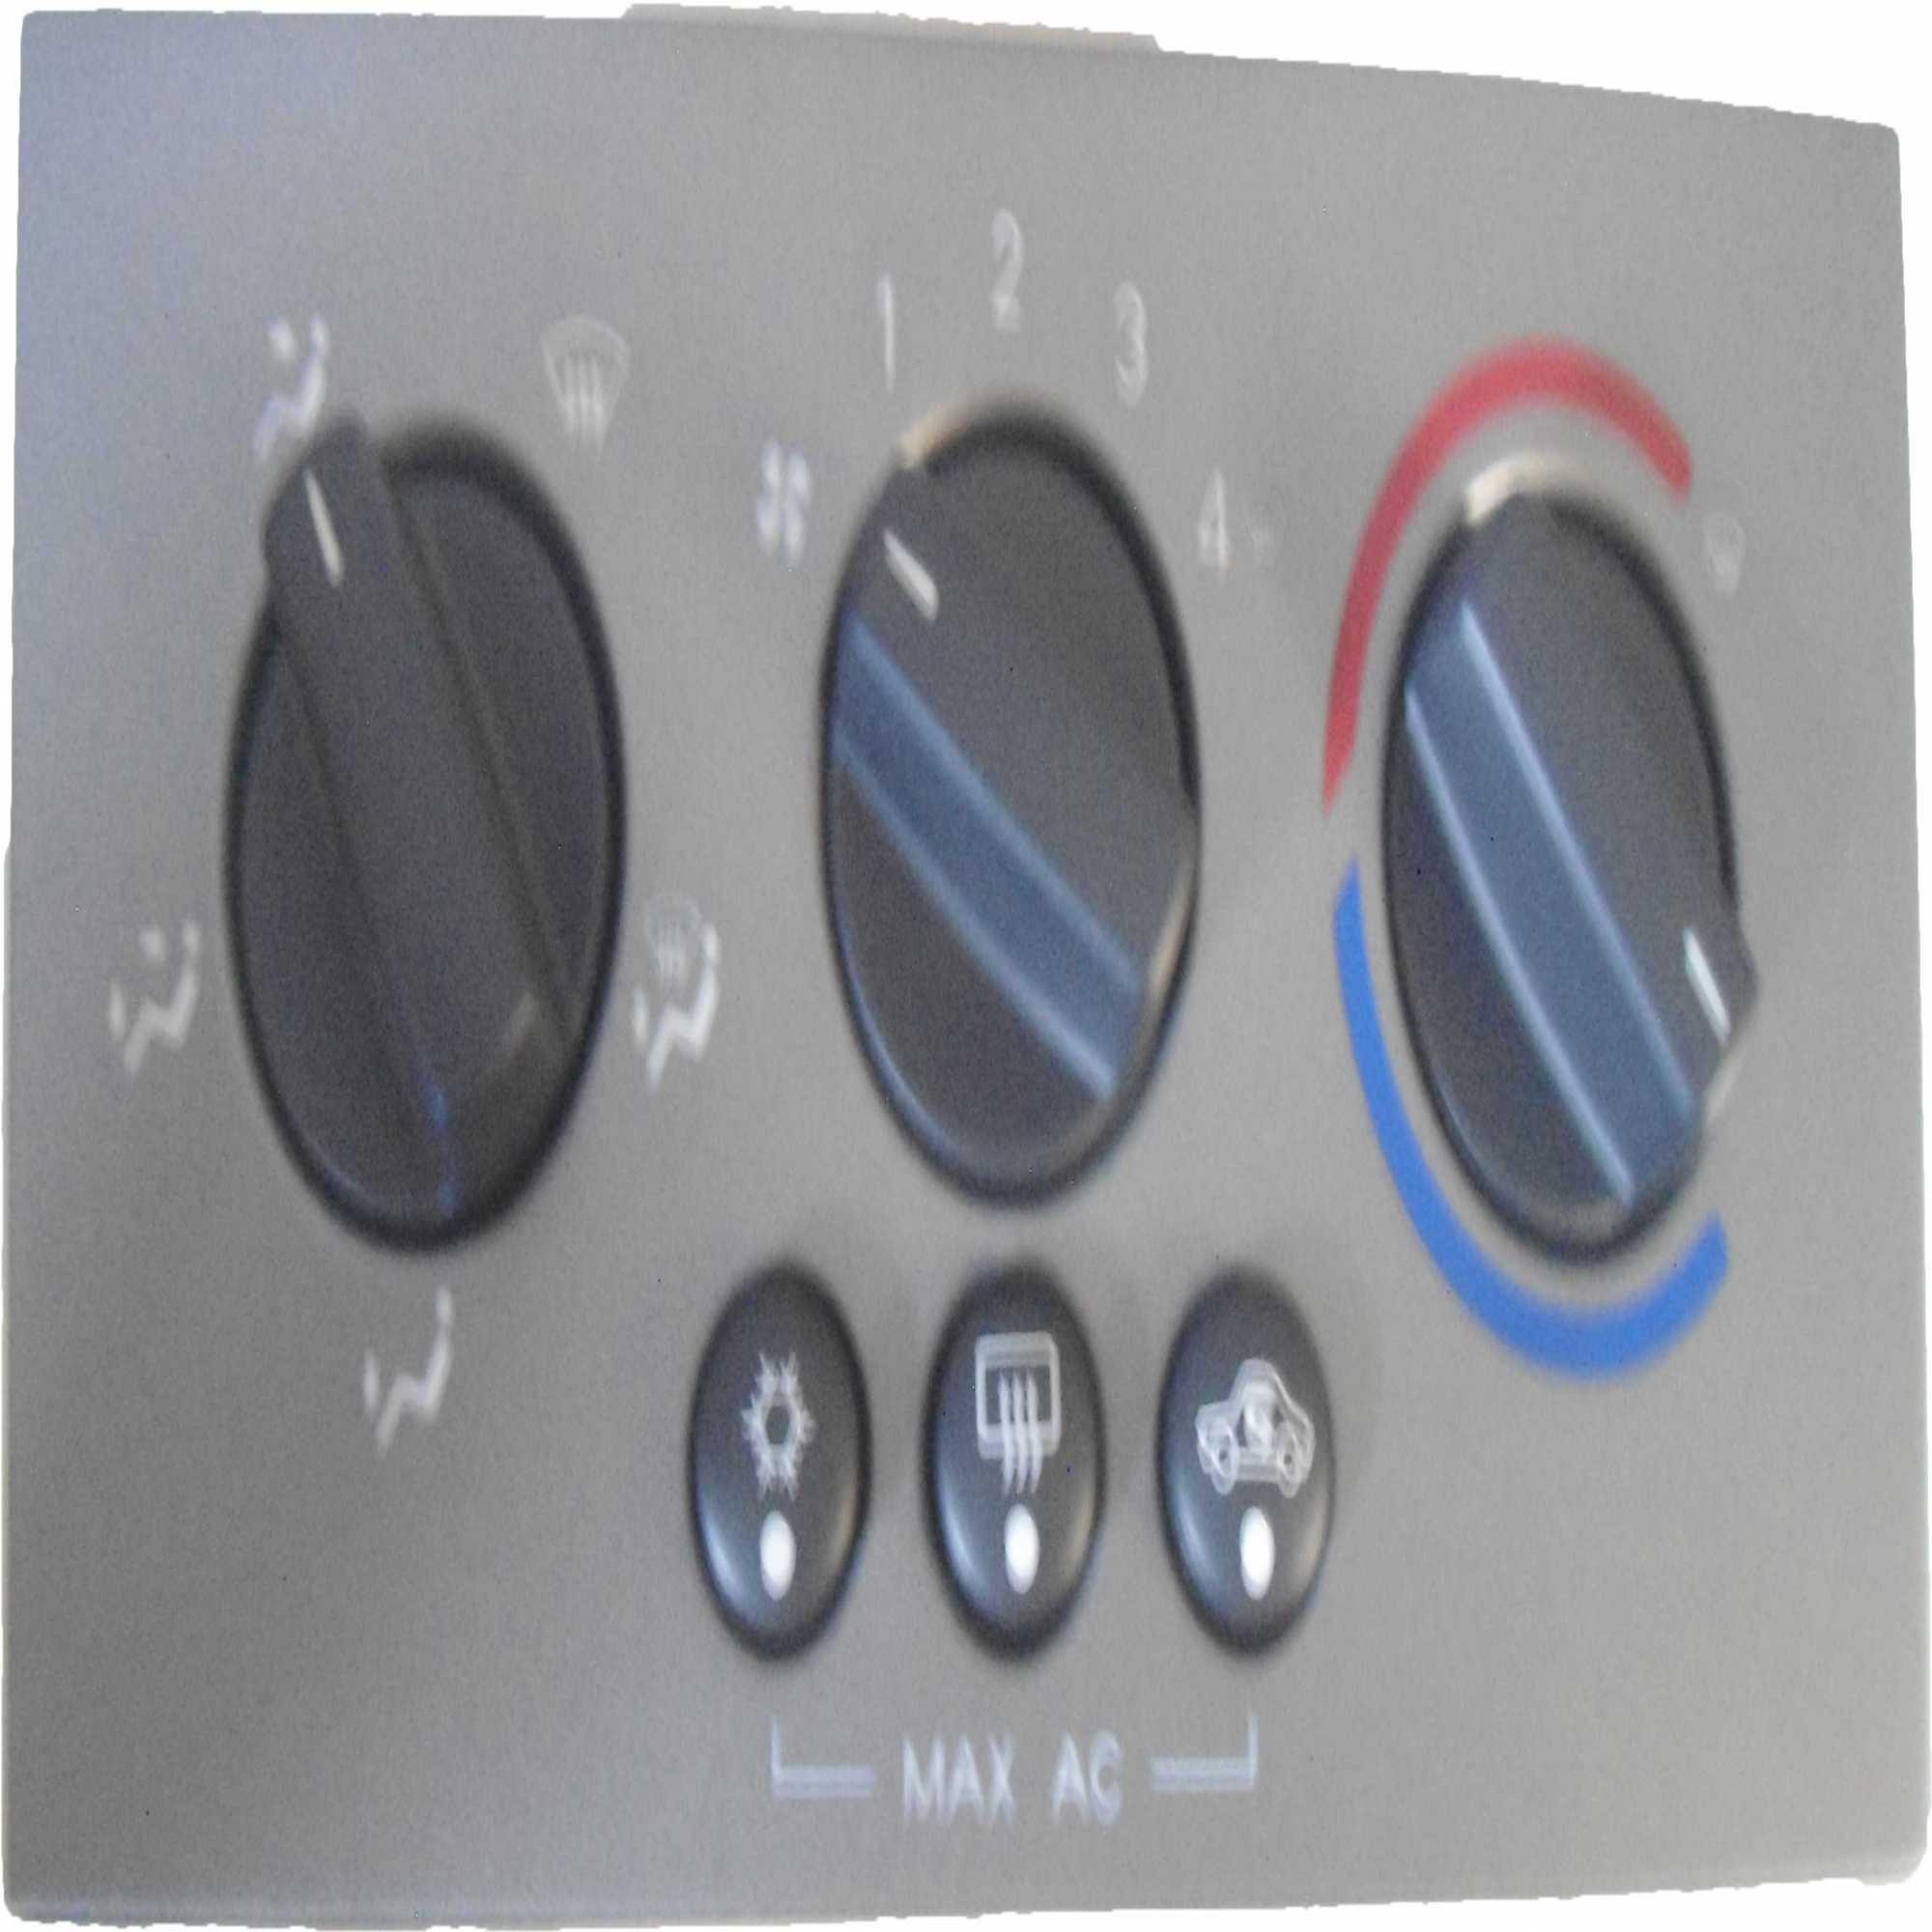 "Painel Controle - Vectra 06 C/Mascara ""Analogico"" Vectra 06> C/Mascara *Analogico*"